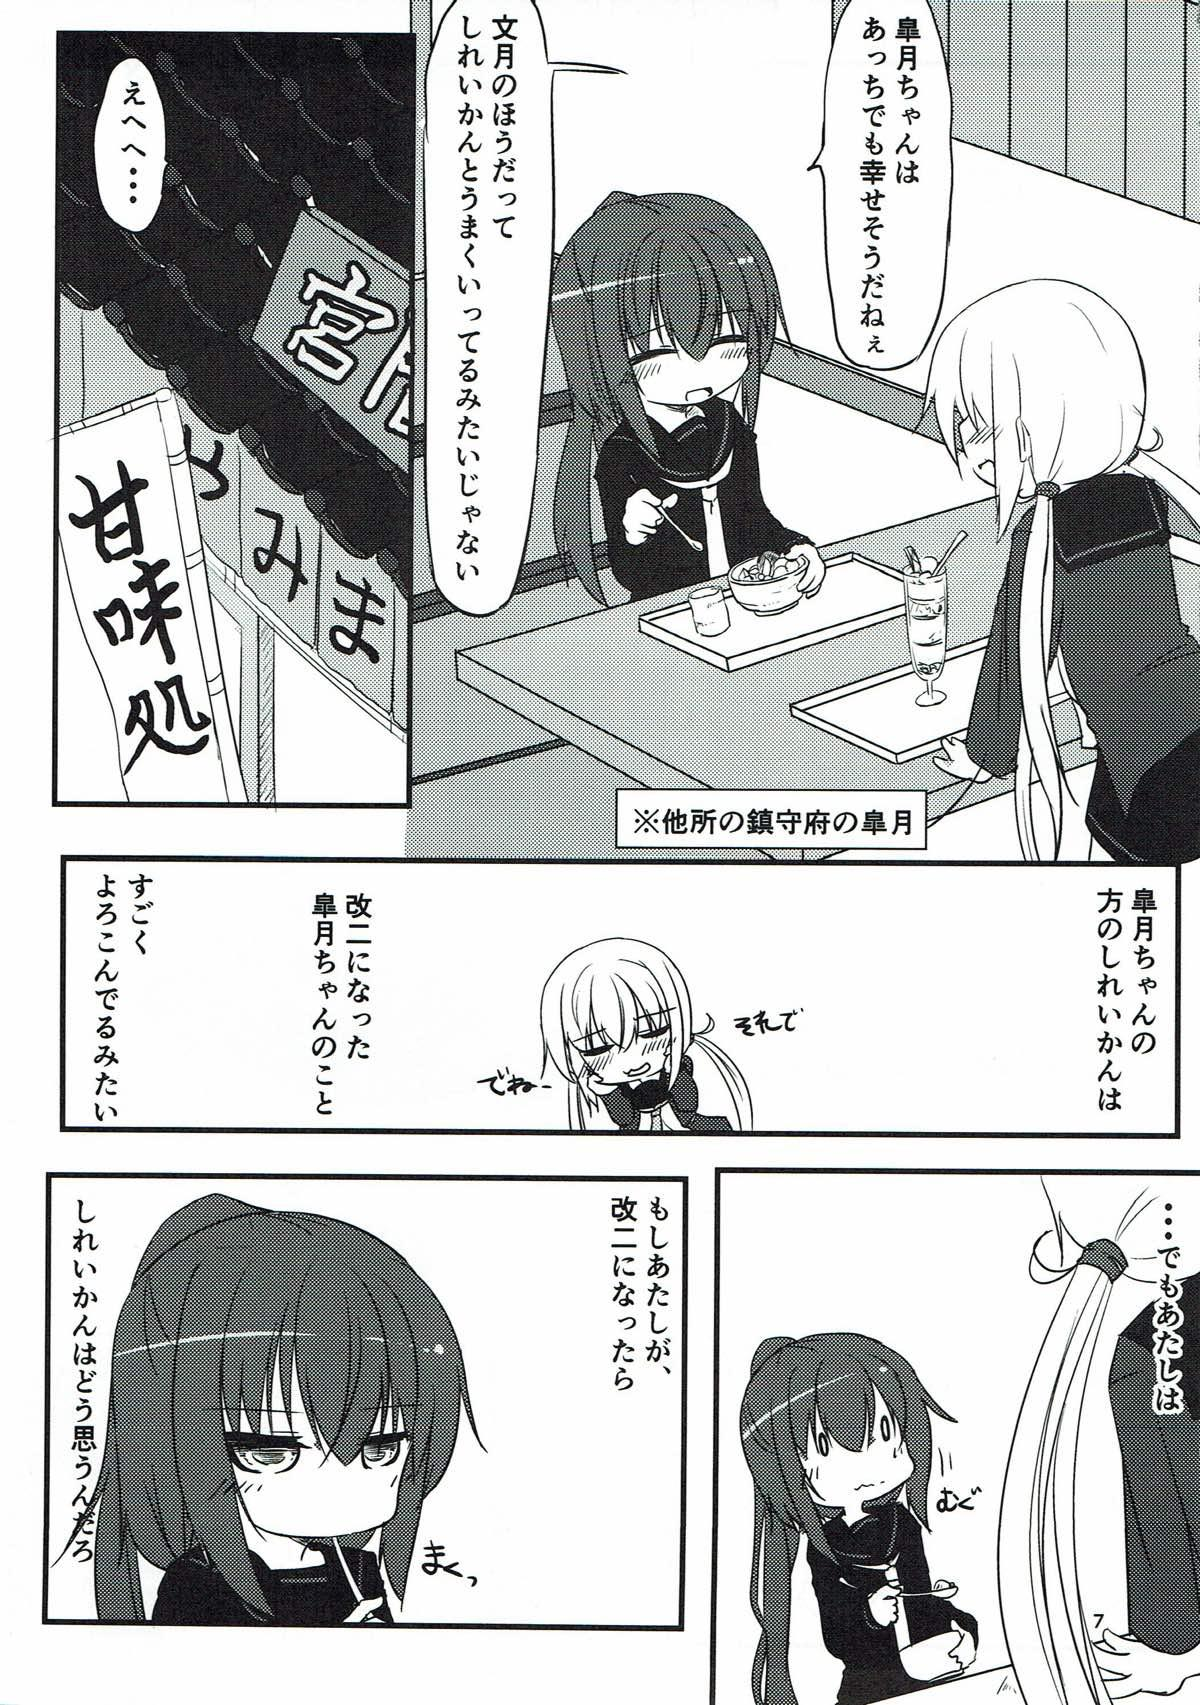 Fumizuki datte Chanto Dekirun dakara! 5